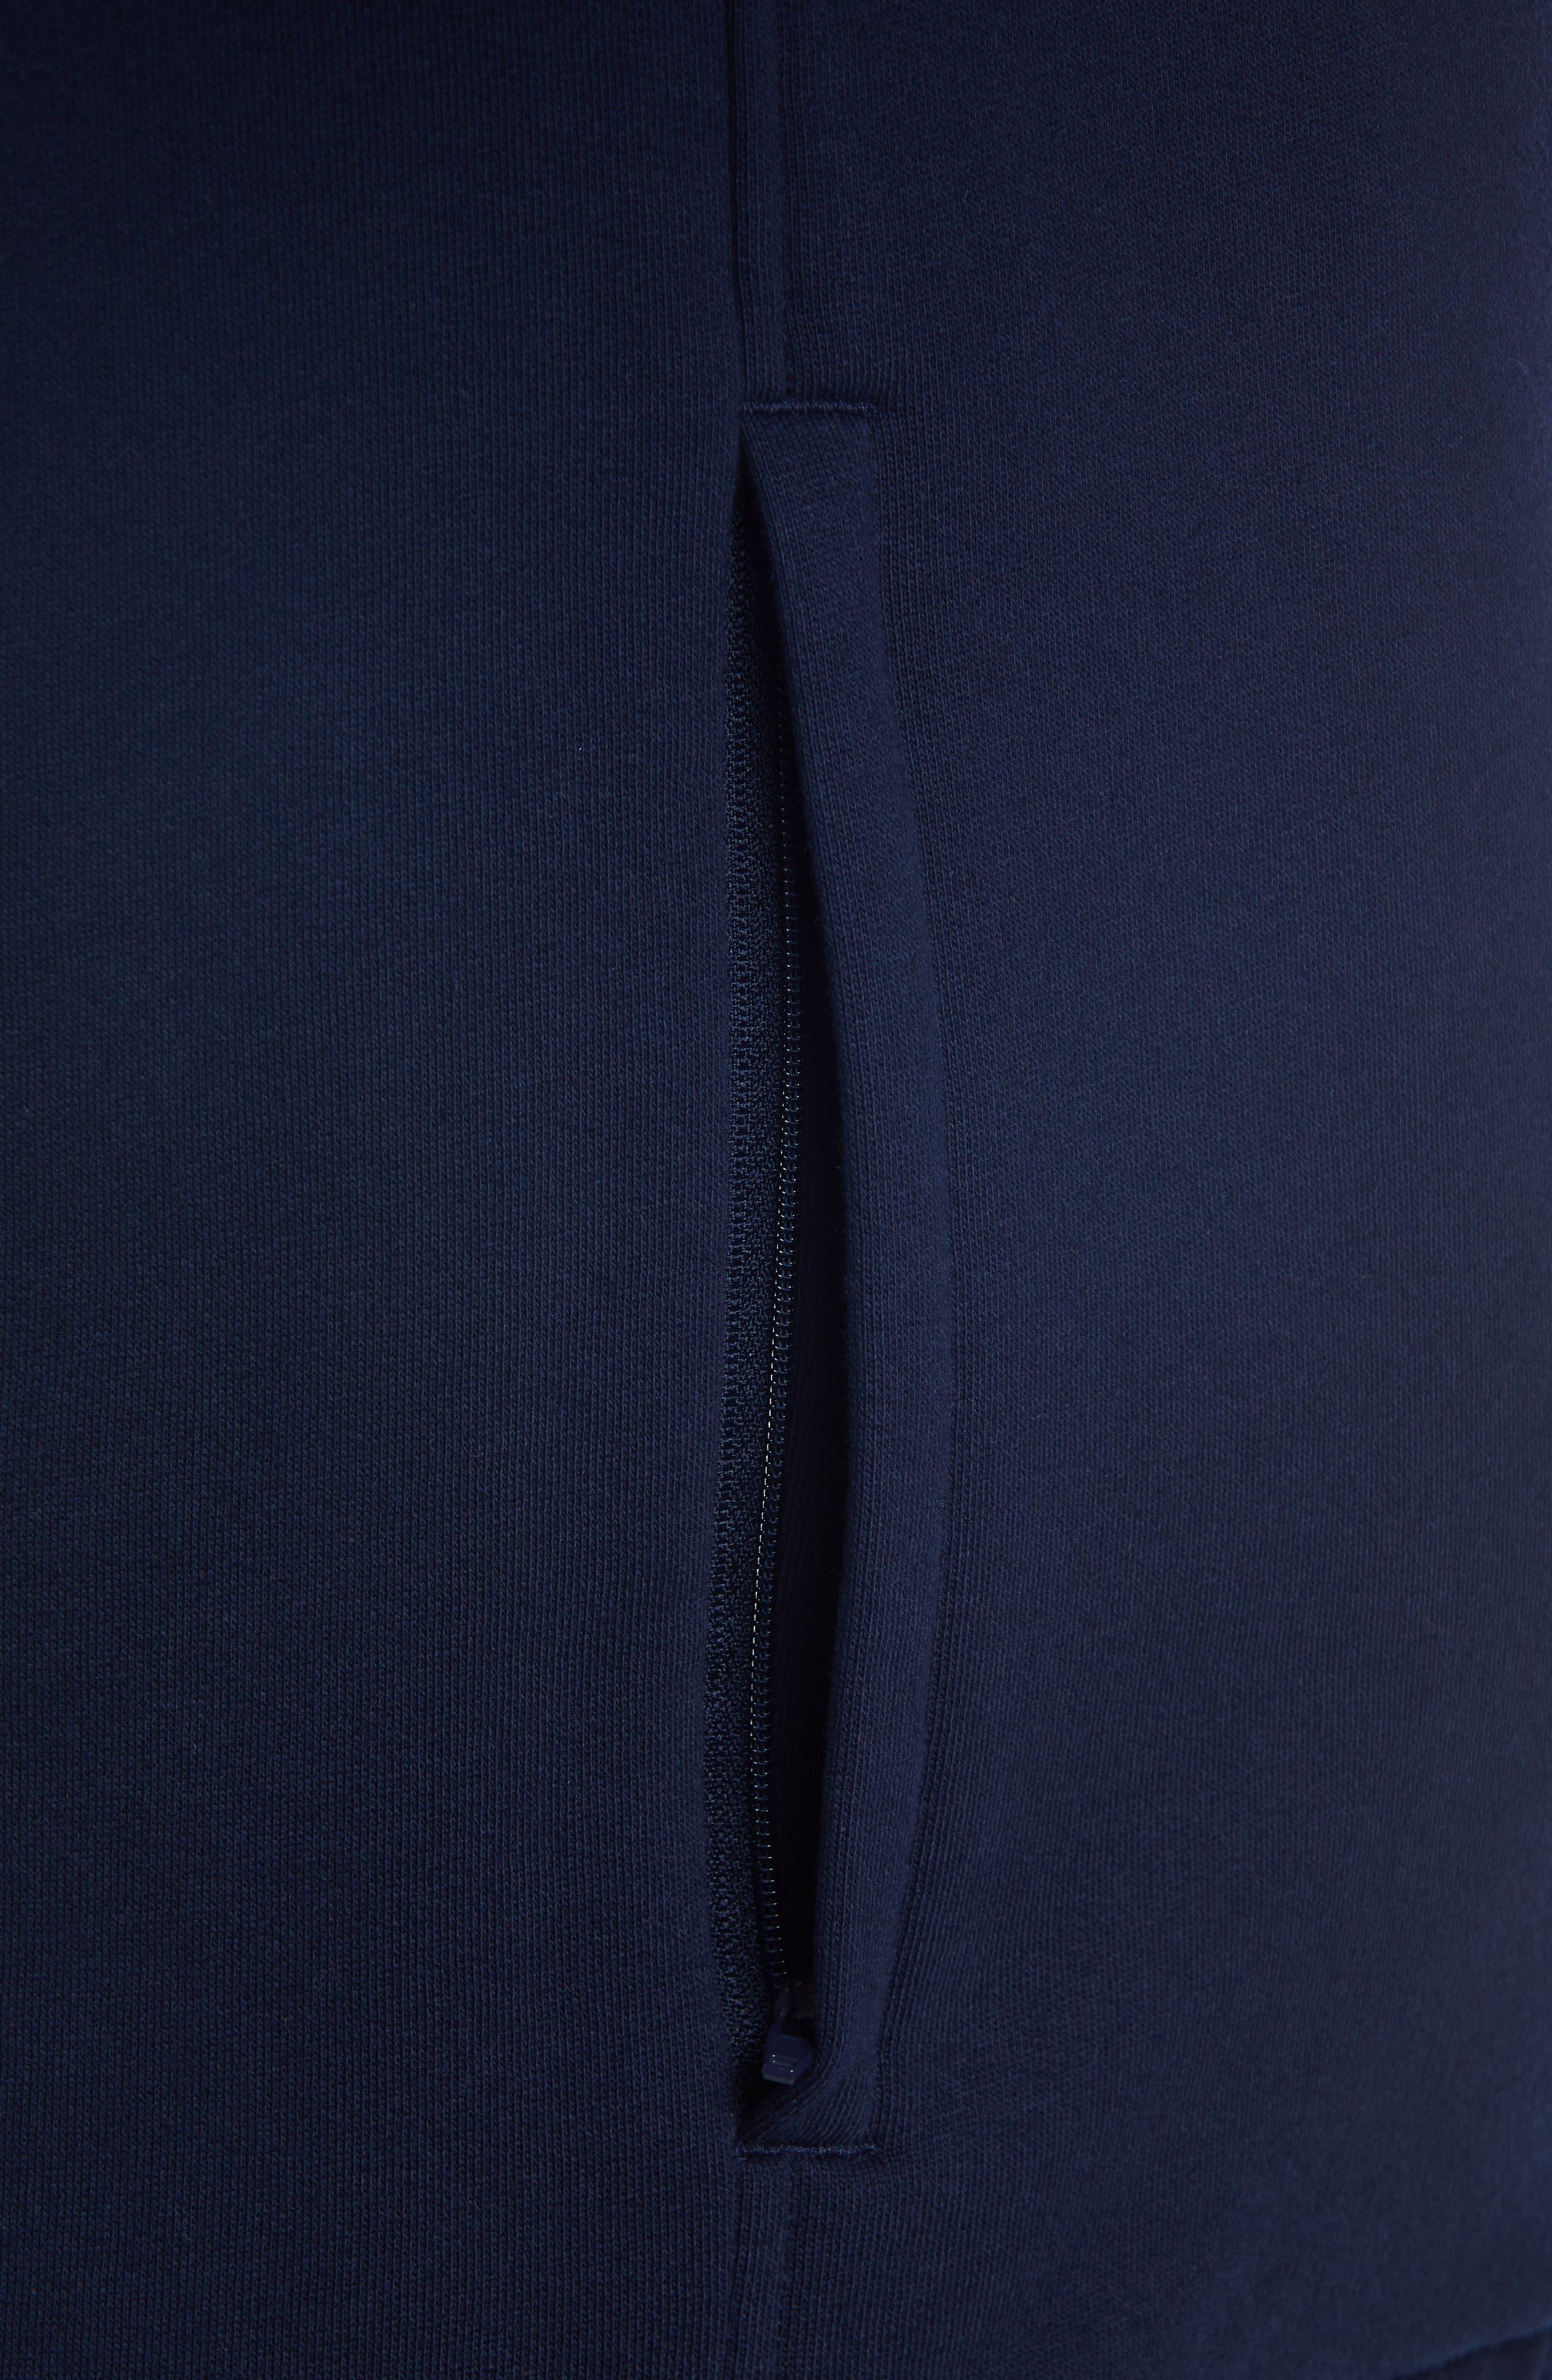 Fleece Zip Jacket,                             Alternate thumbnail 8, color,